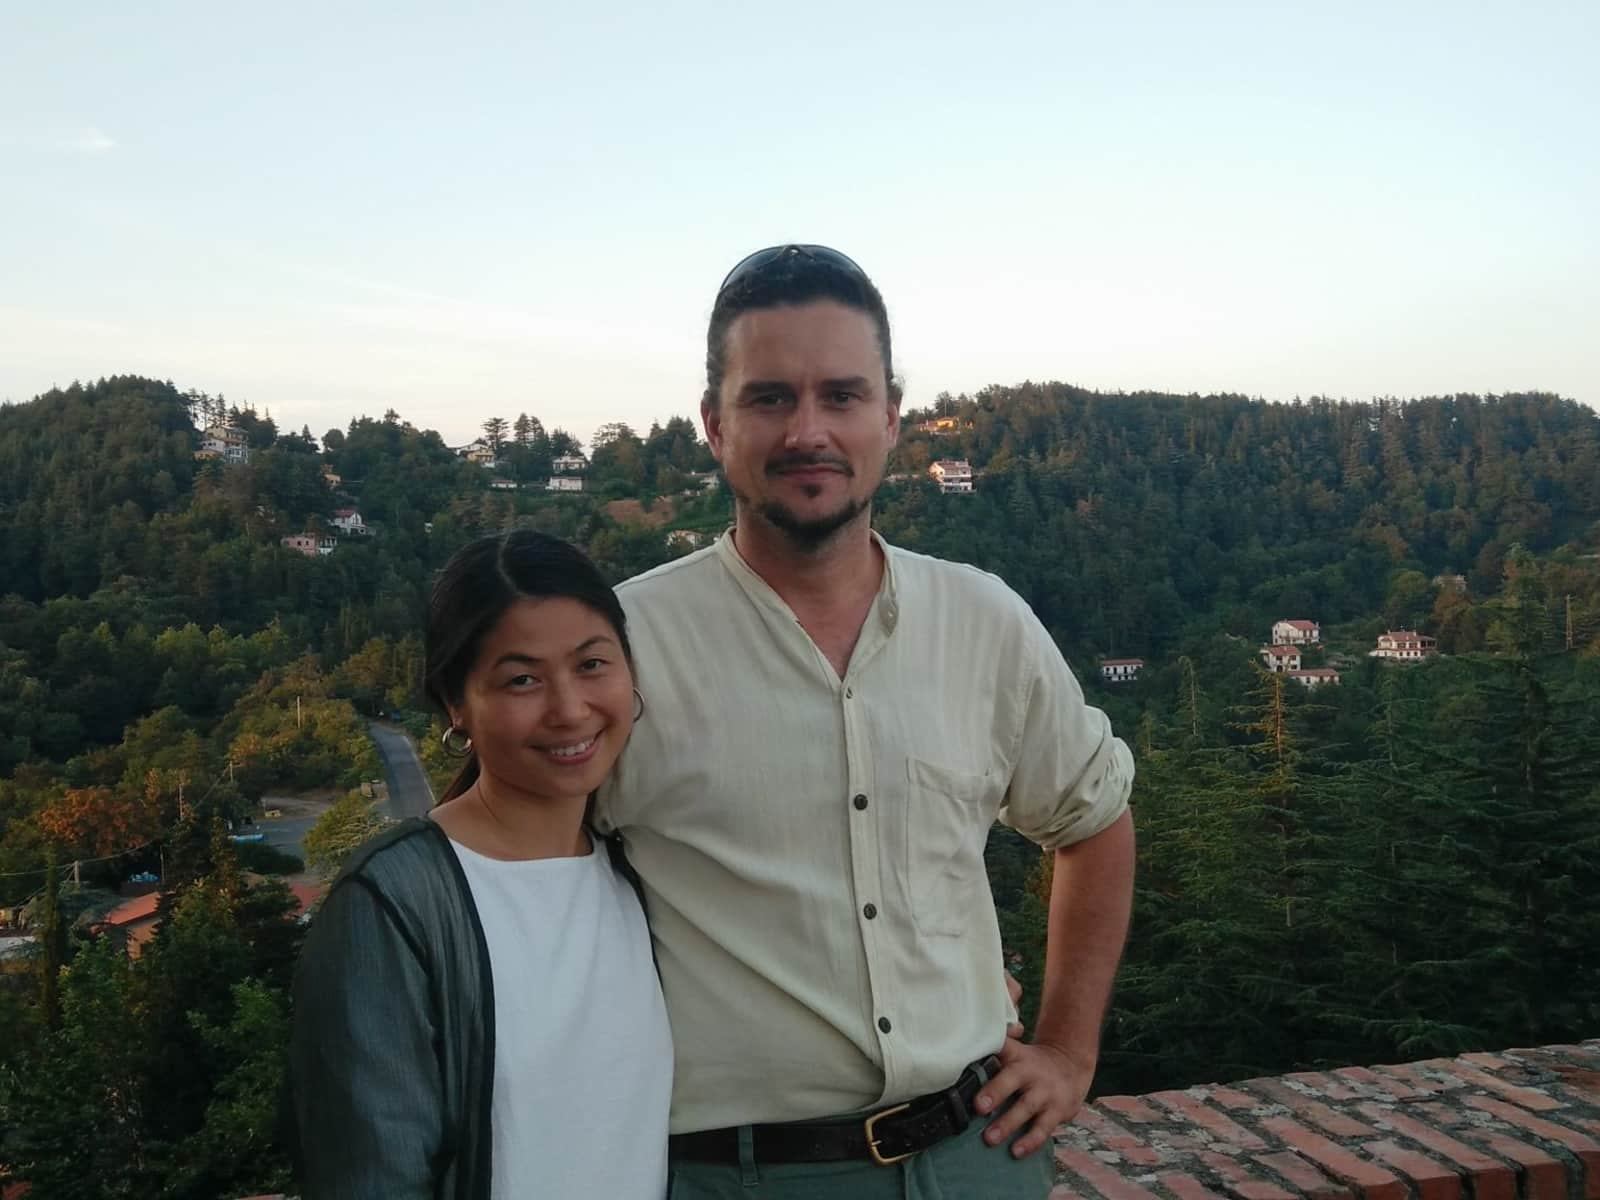 Weiwei & Paolo from Fosdinovo, Italy